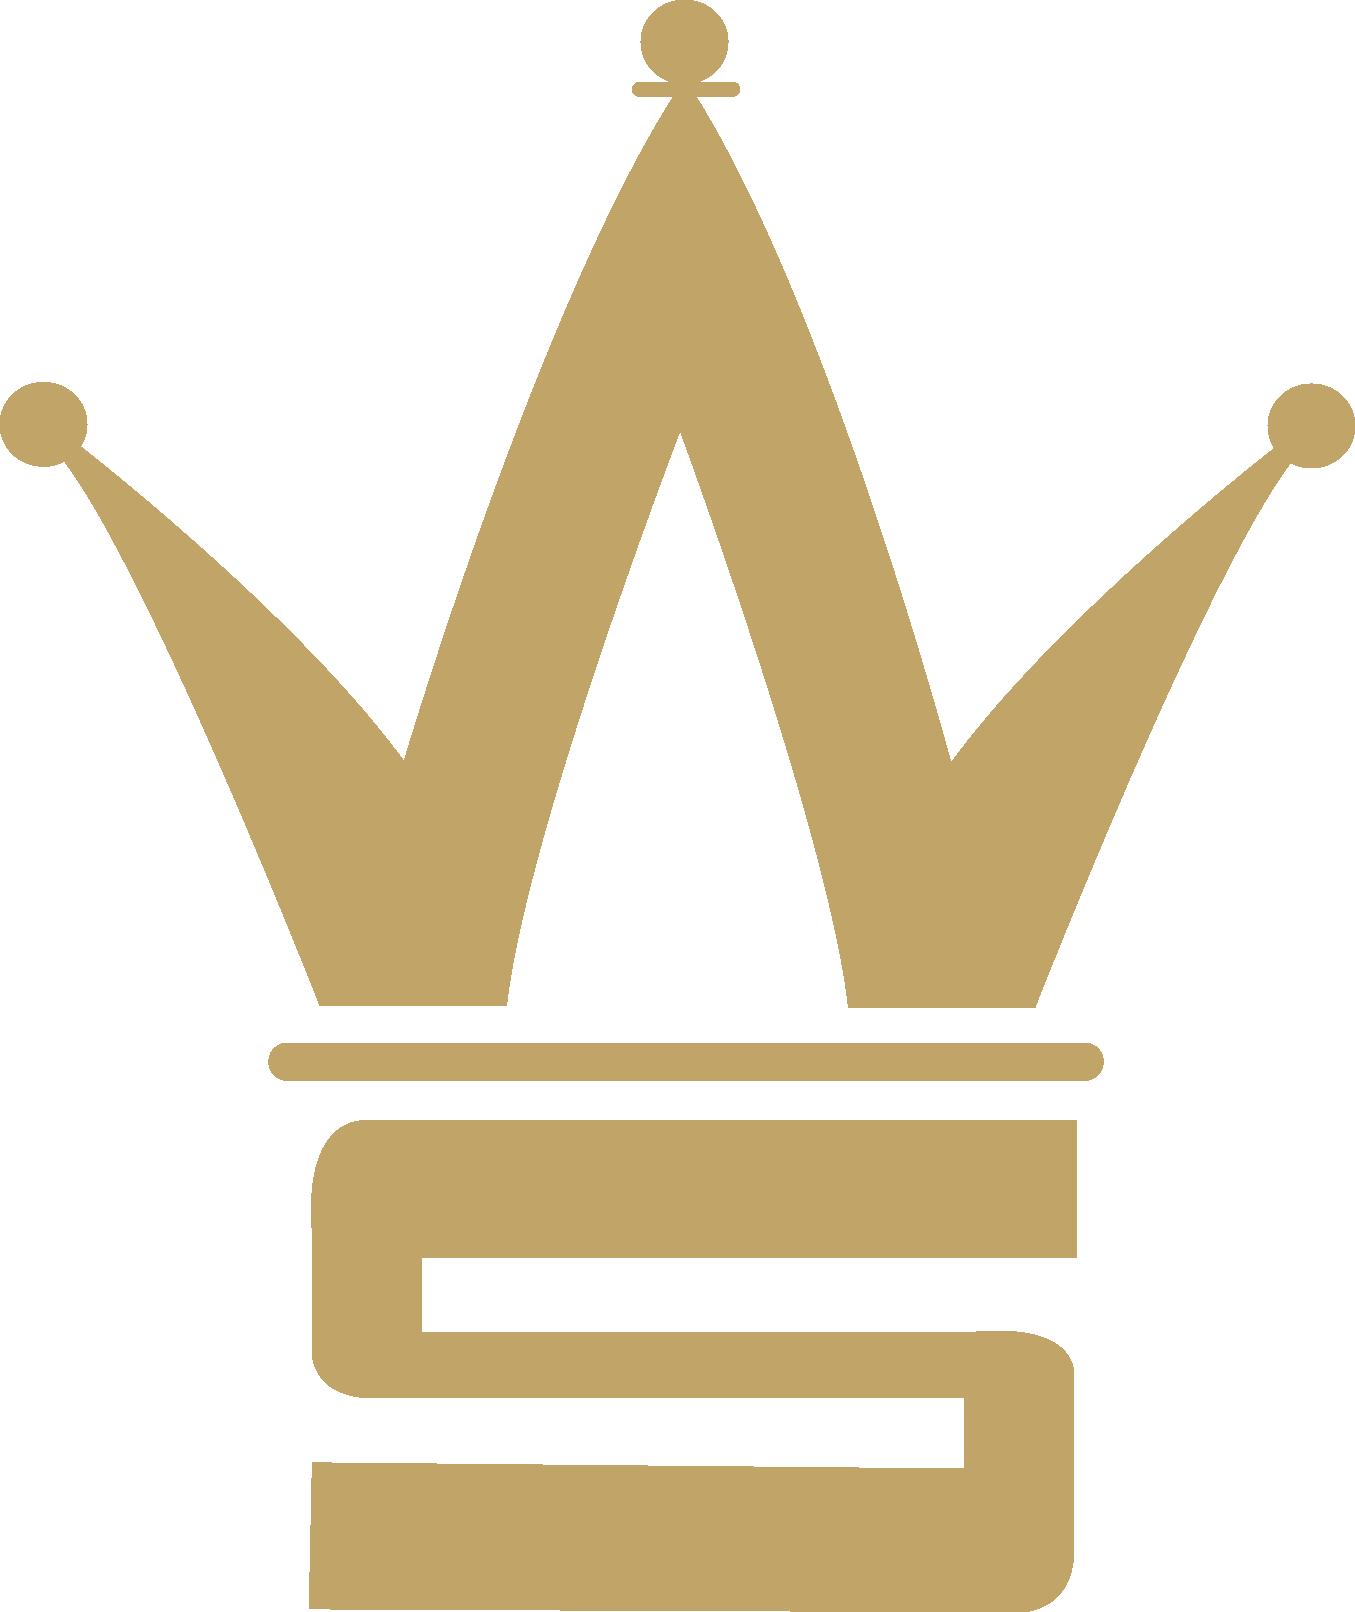 worldstarhiphop logo png 12000 vector logos